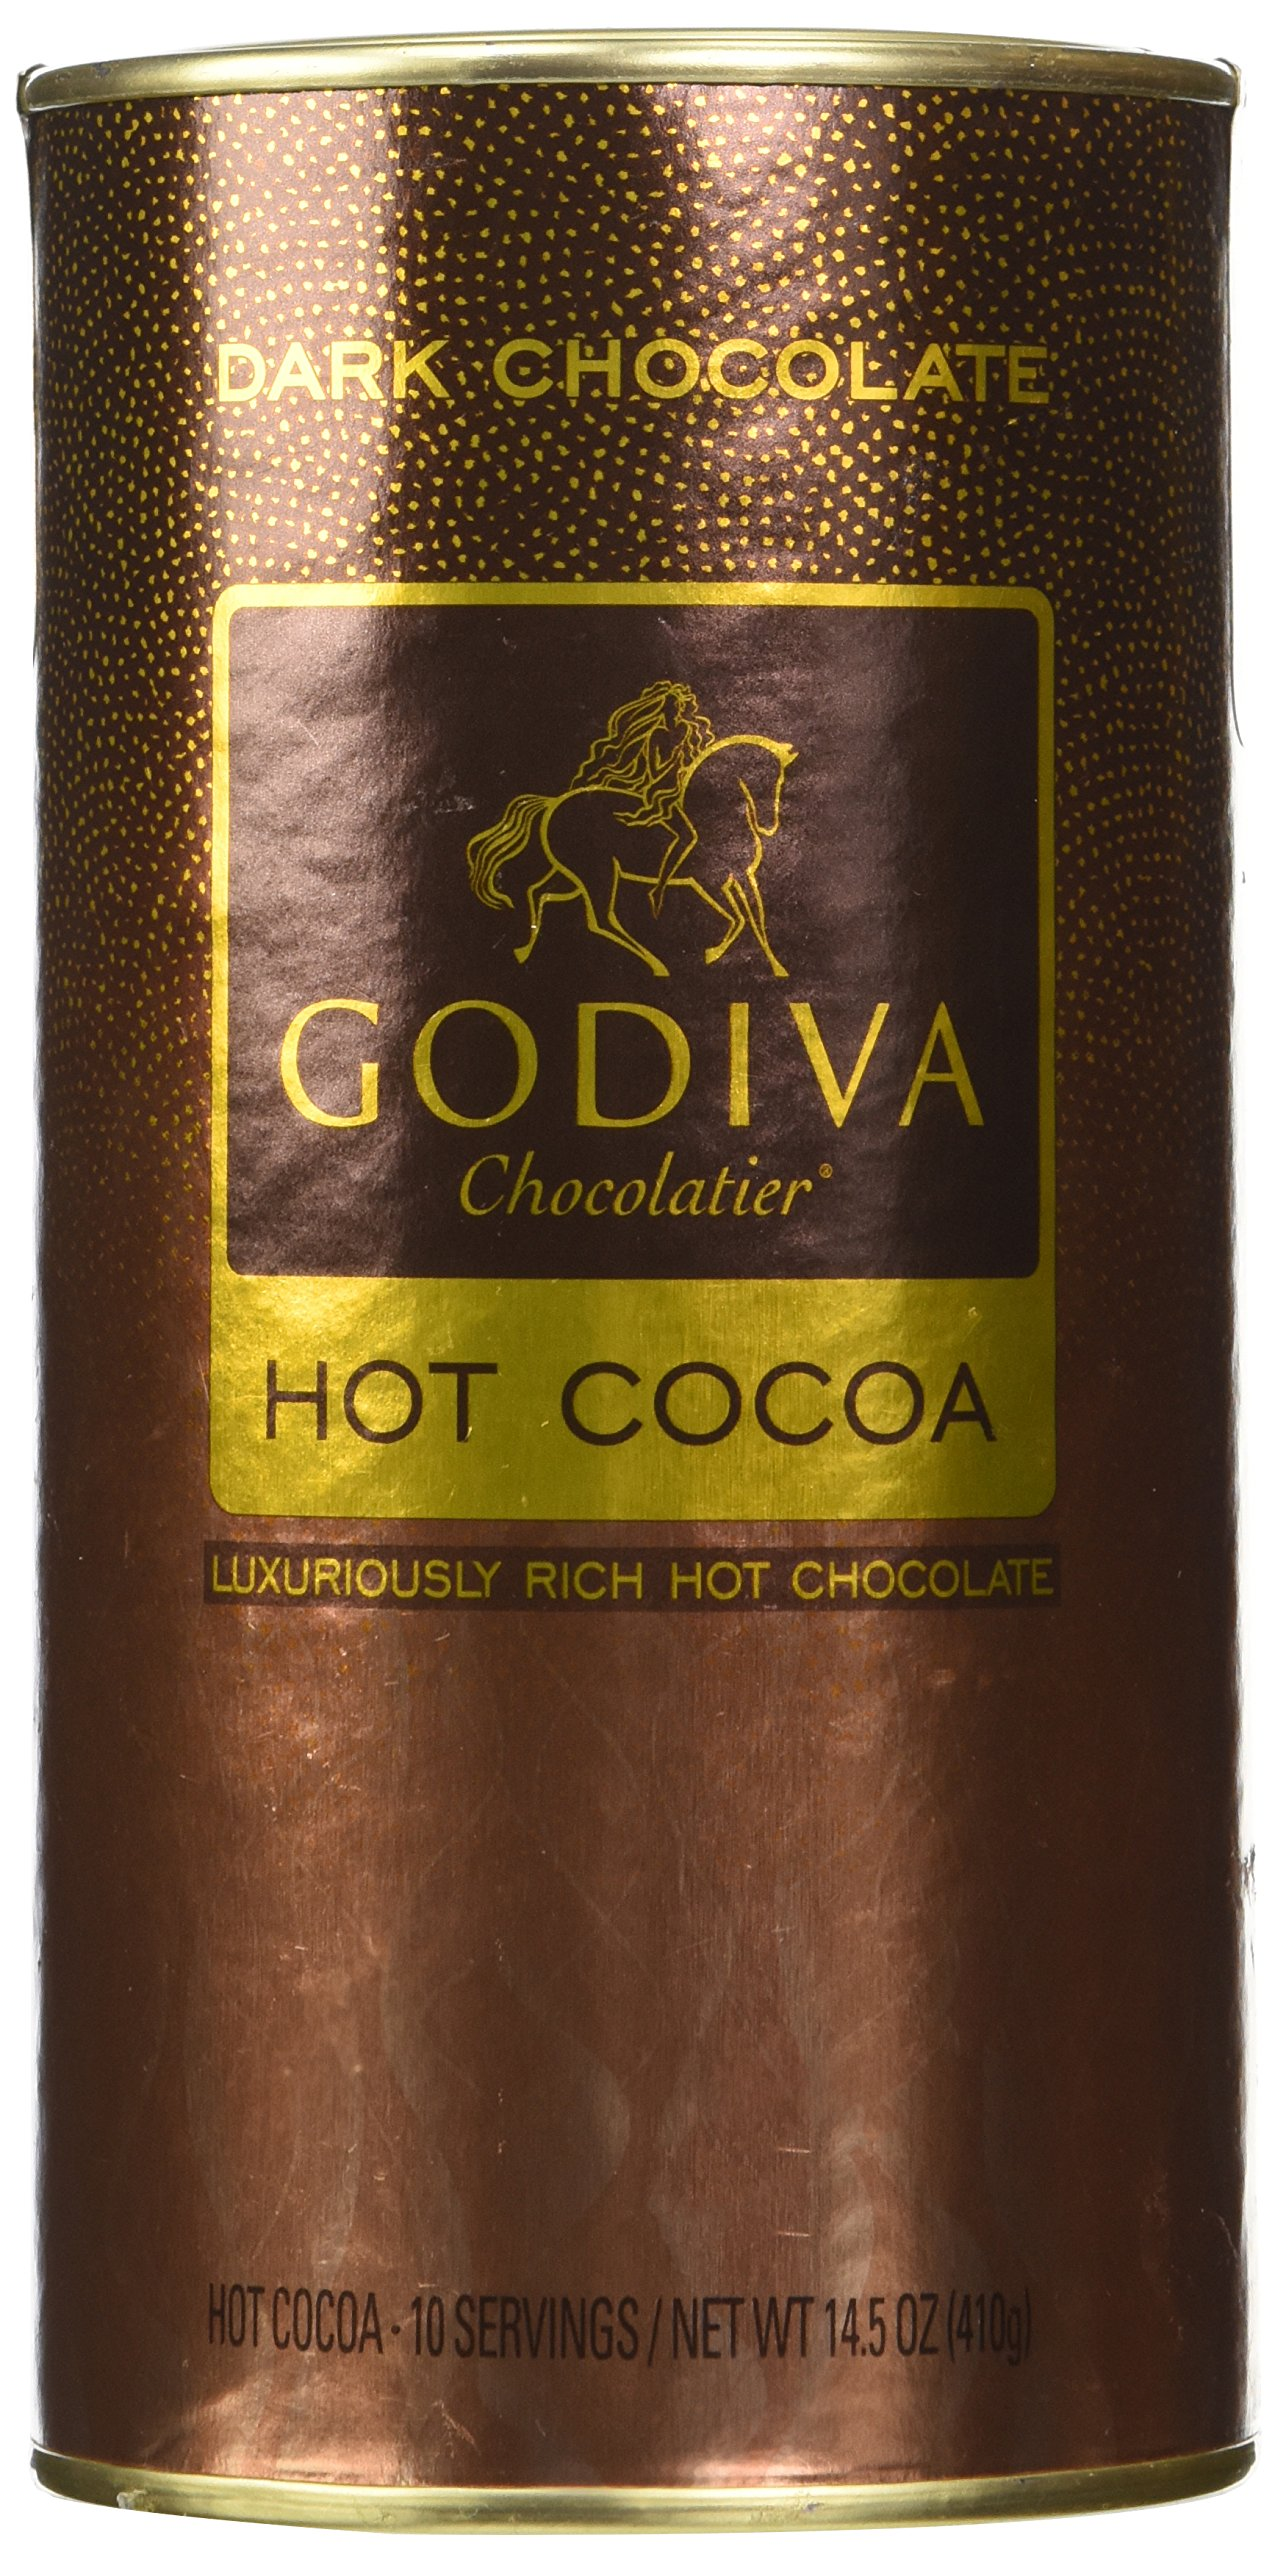 GODIVA Chocolatier Hot Cocoa (Set of 3)13.1 OZ by GODIVA Chocolatier